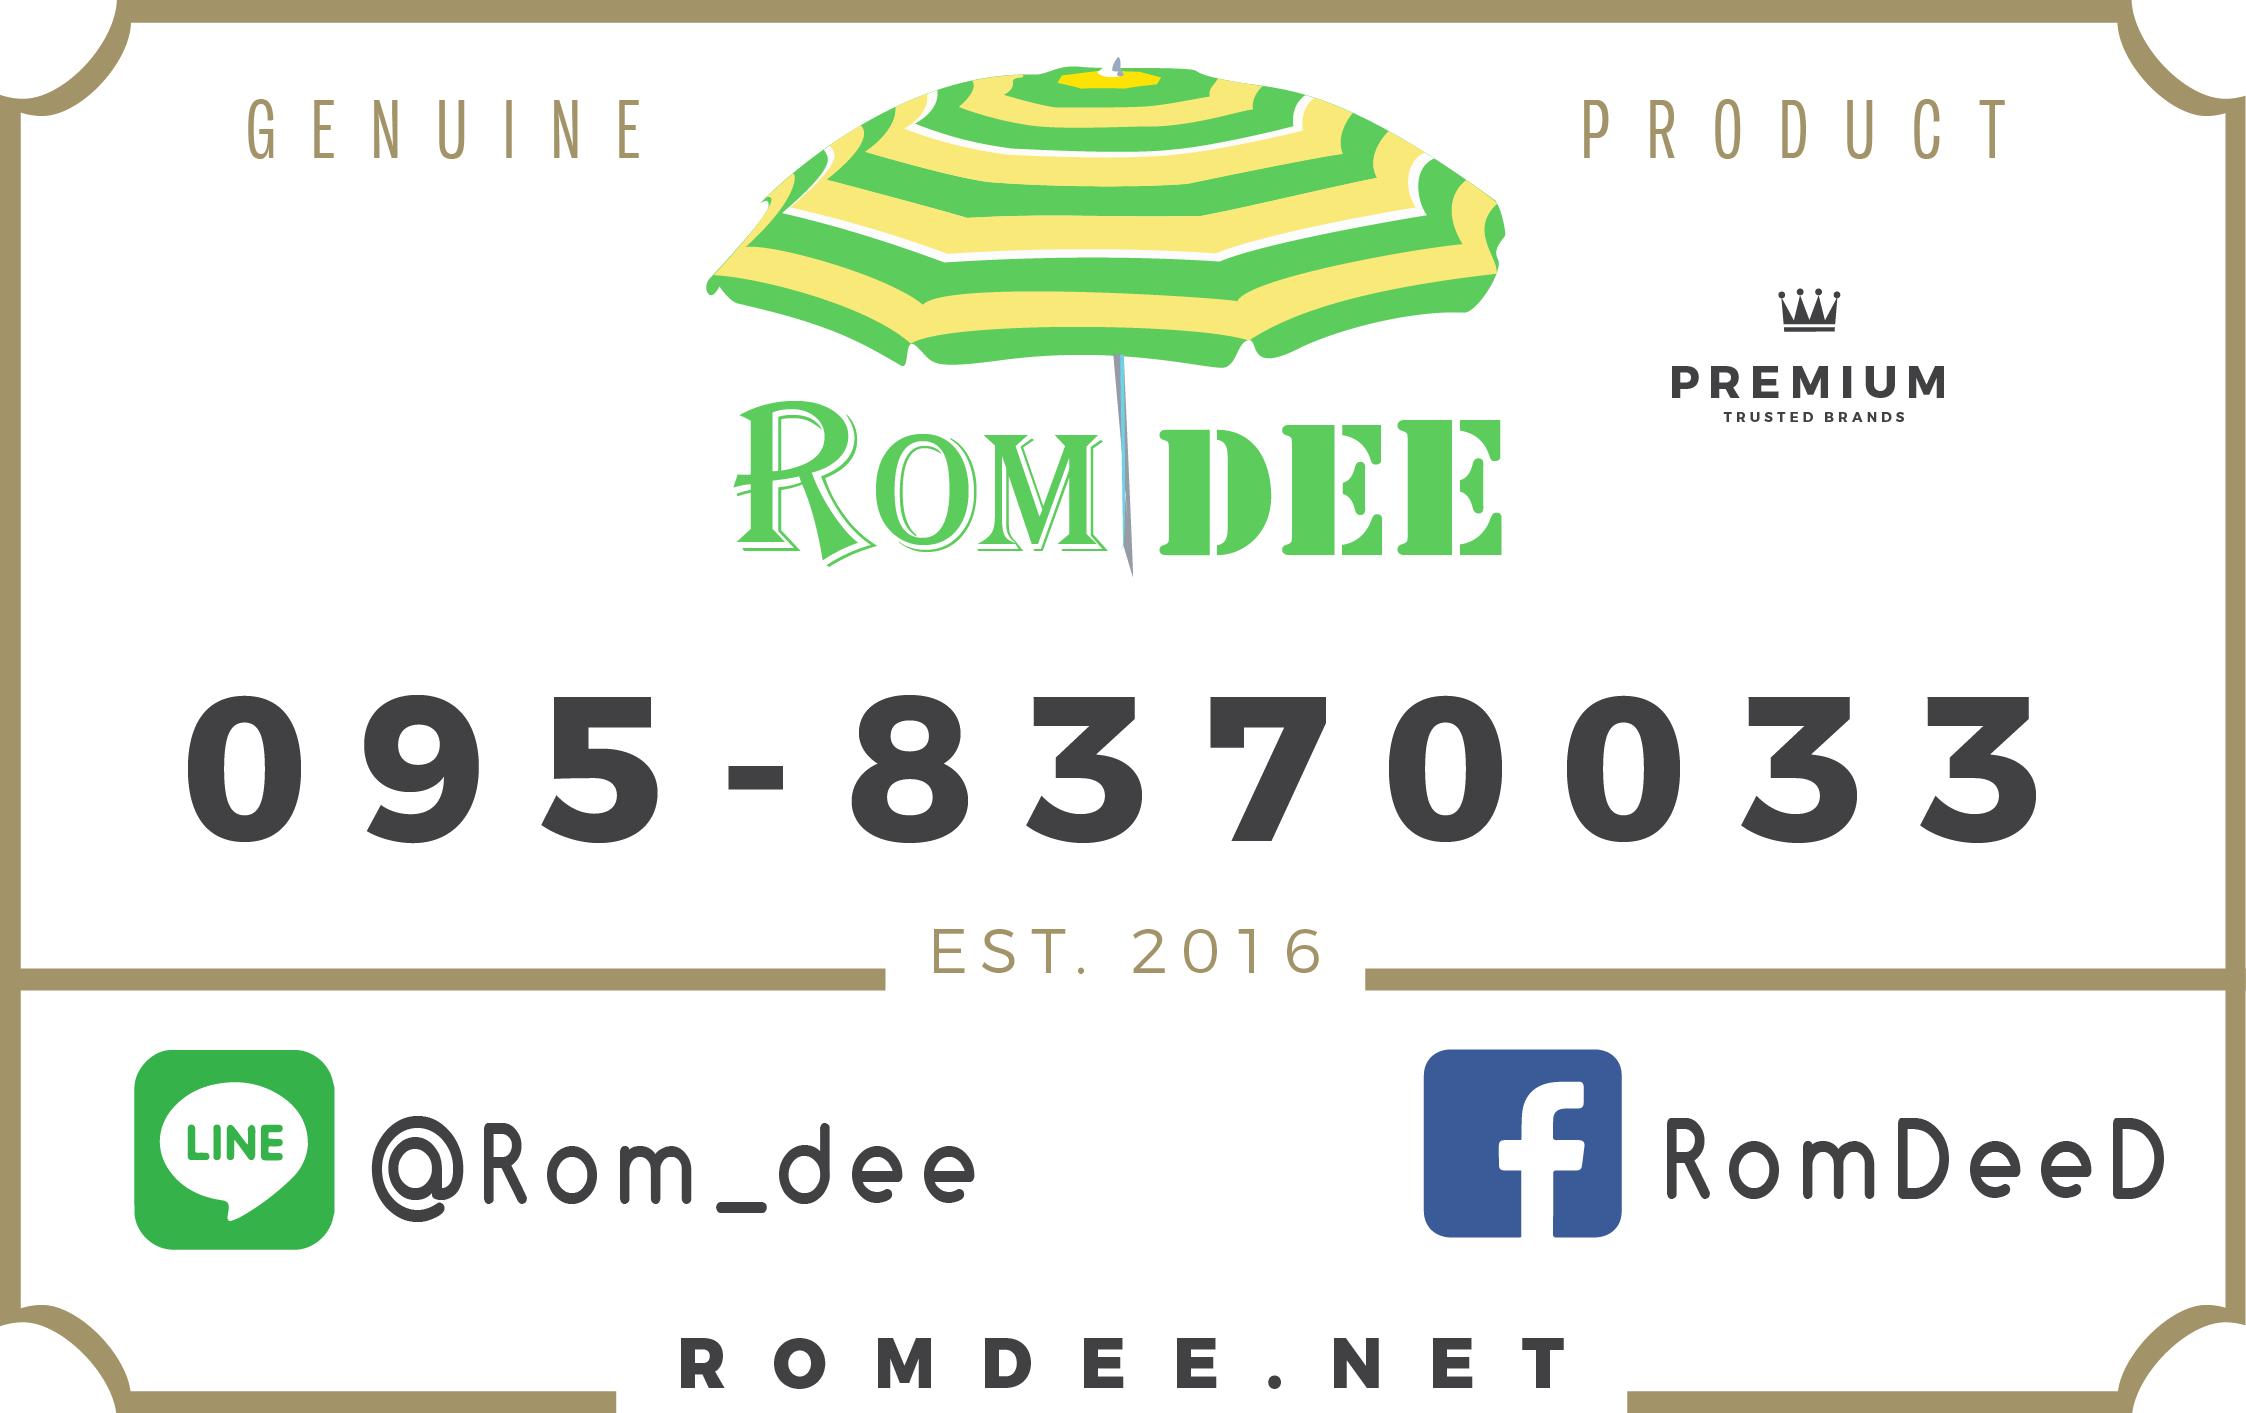 Romdee's Badge - new